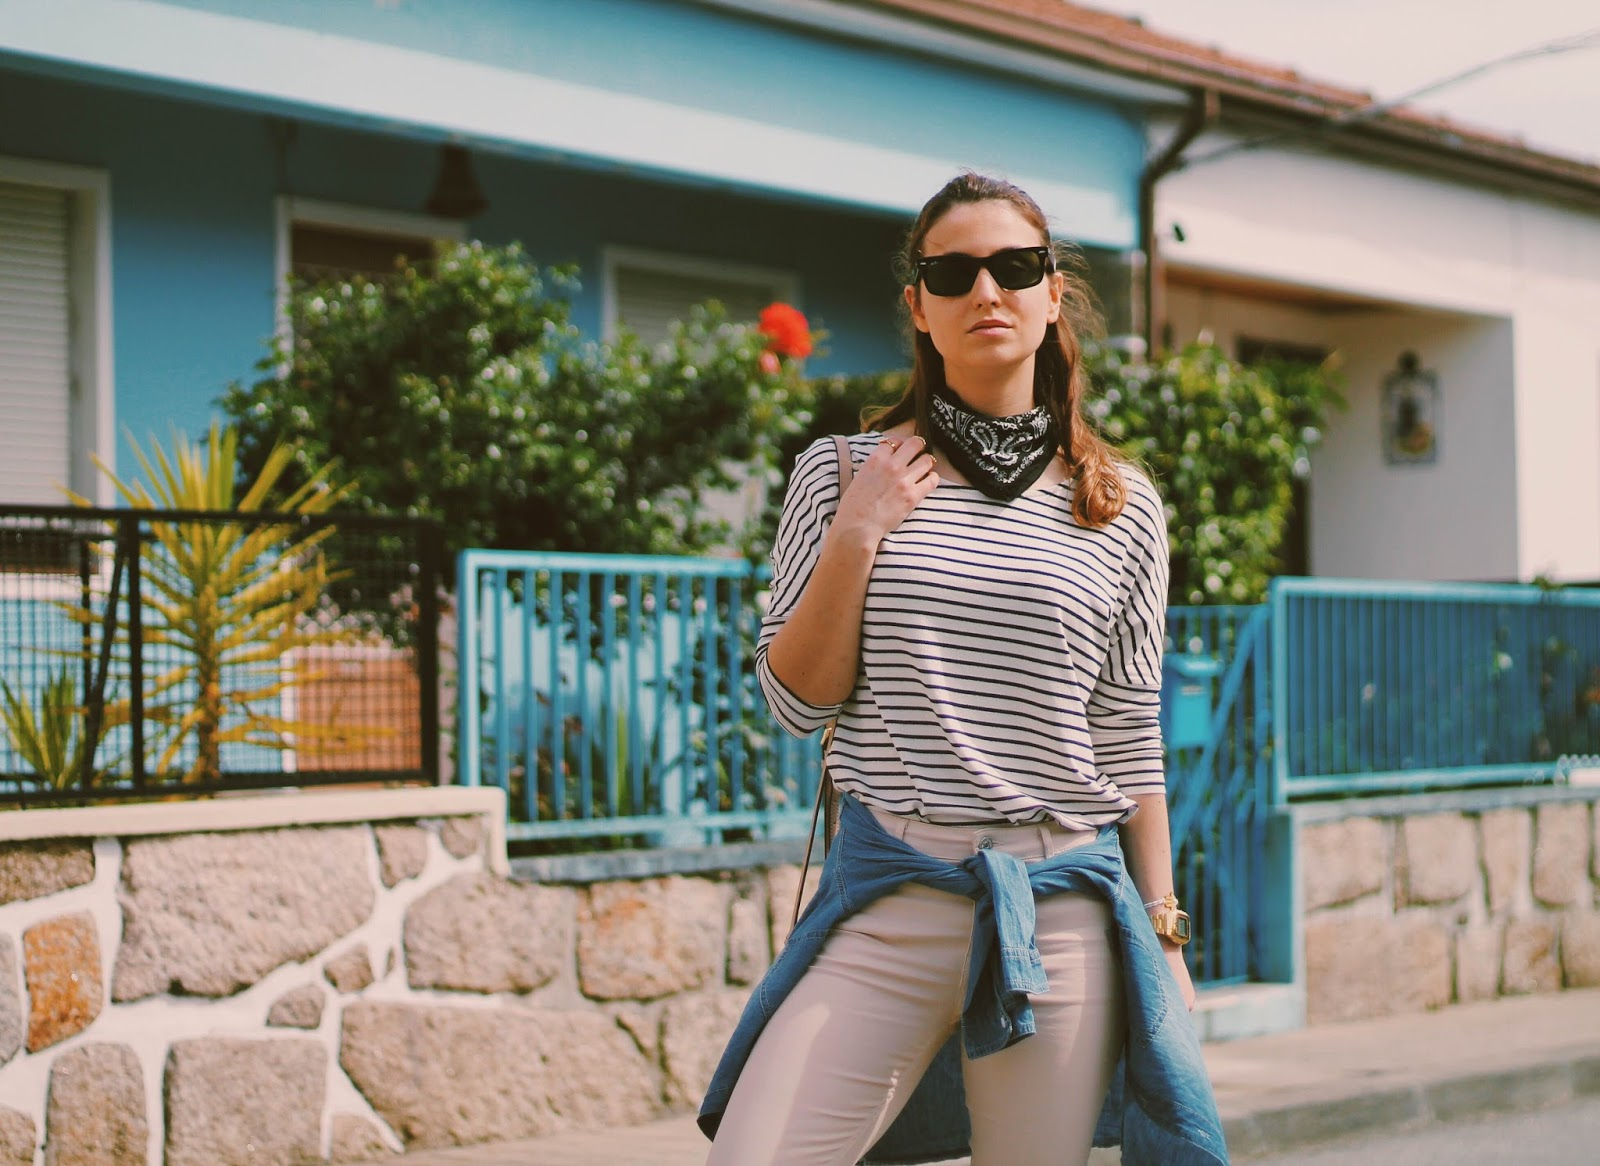 7160953b426b striped beige and black shirt: Pimkie | beige coated jeans: Mango | denim  shirt: c/o SheIn blush bag: Michael Kors Selma Mini messenger (similar  here) ...